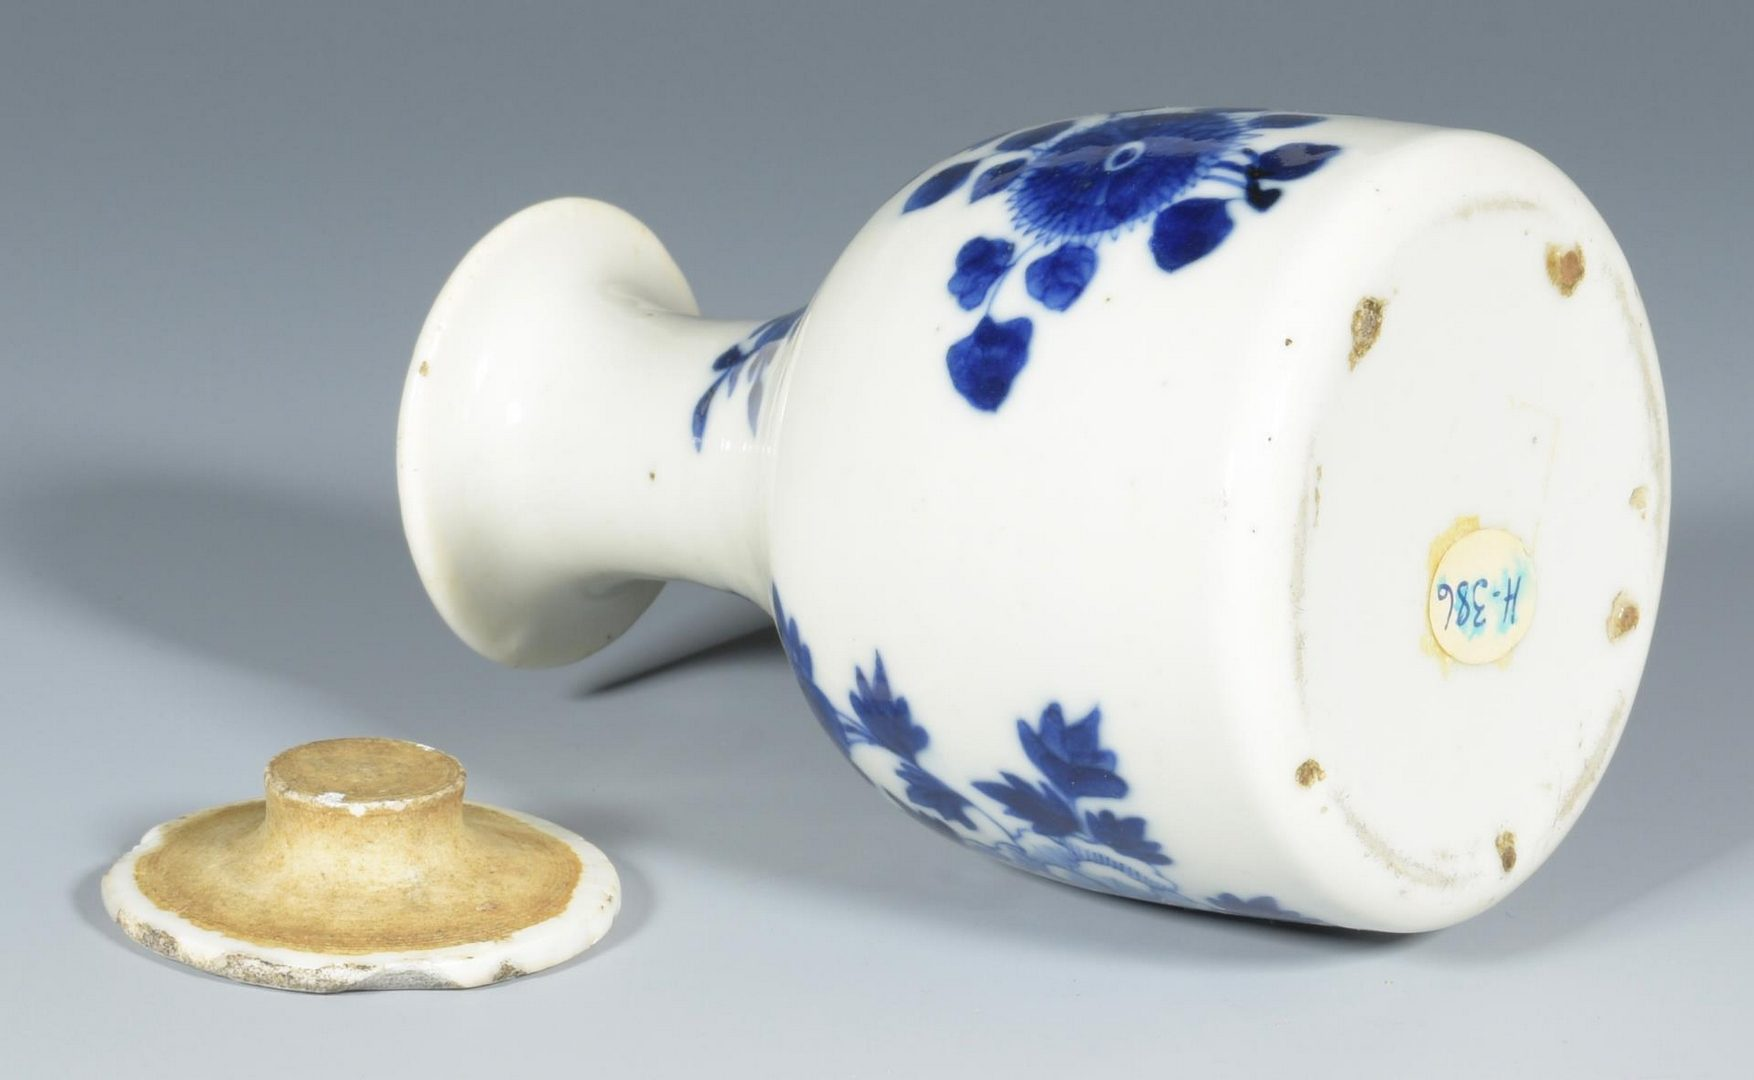 Lot 130: Asian Snuff bottle, Imari and Ewer – 4 items